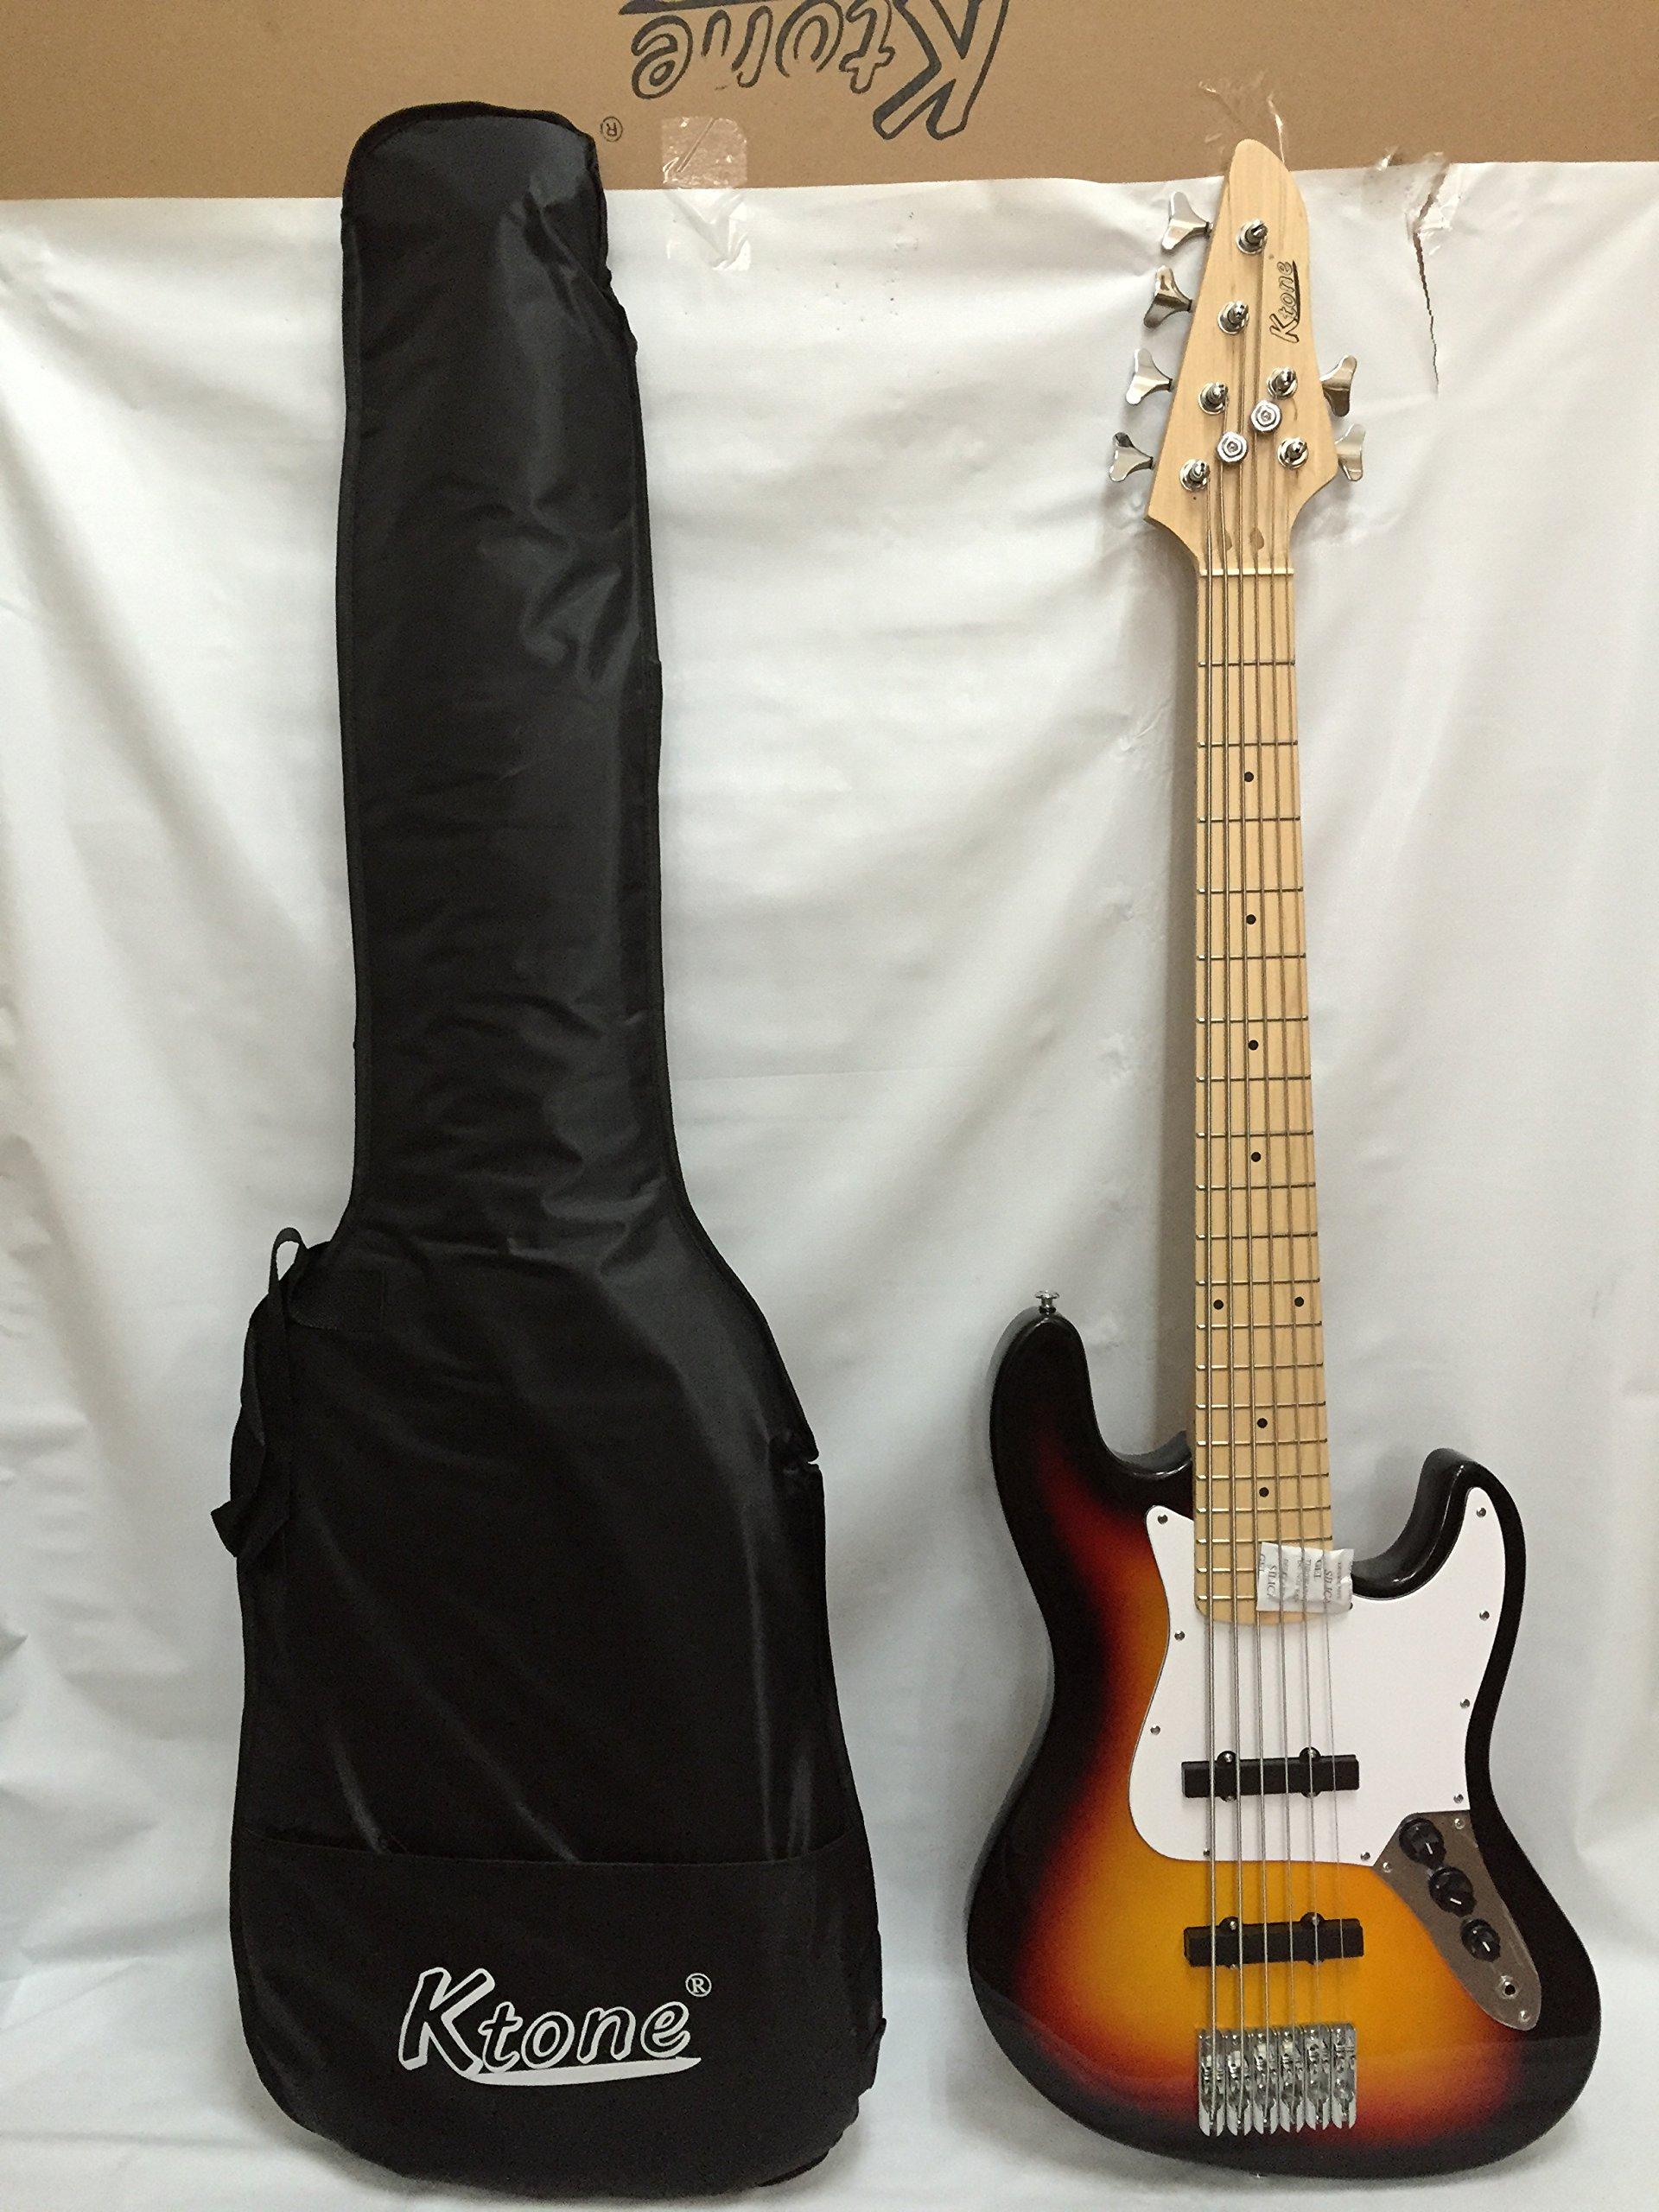 6 3ts 6 String Bass Guitar, Free Gig Bag